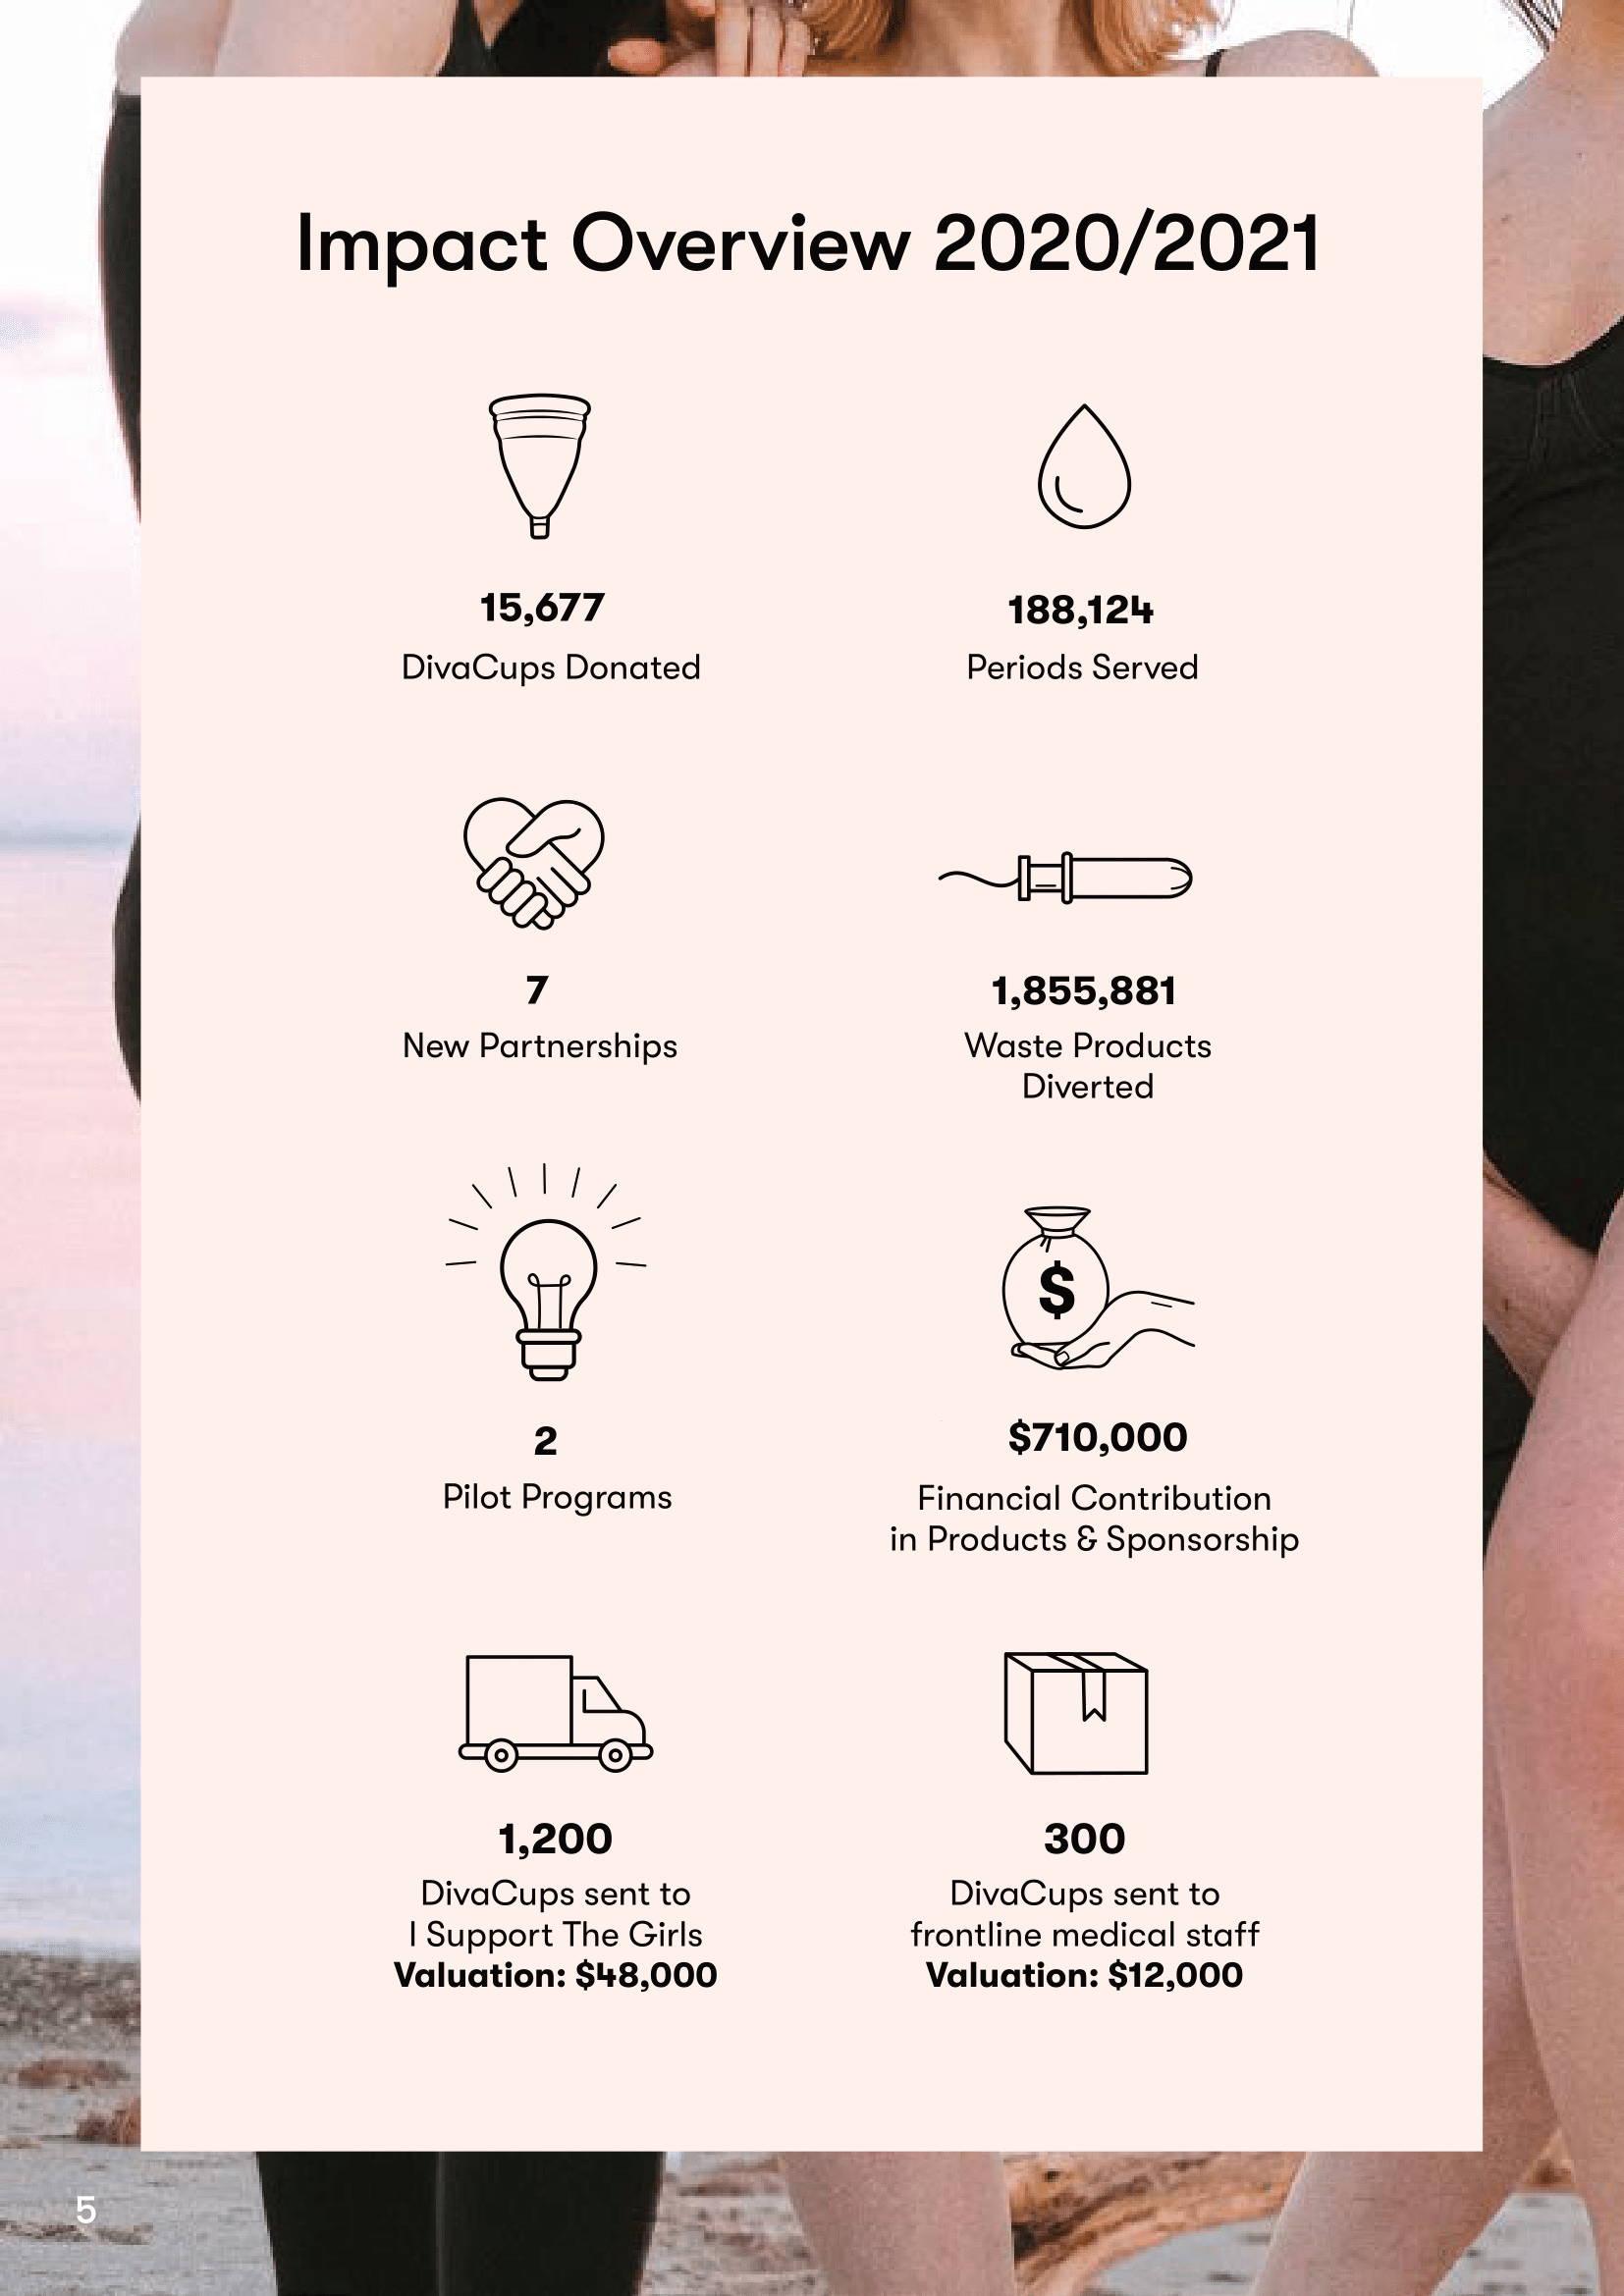 Diva Impact Report overview 2020/2021.